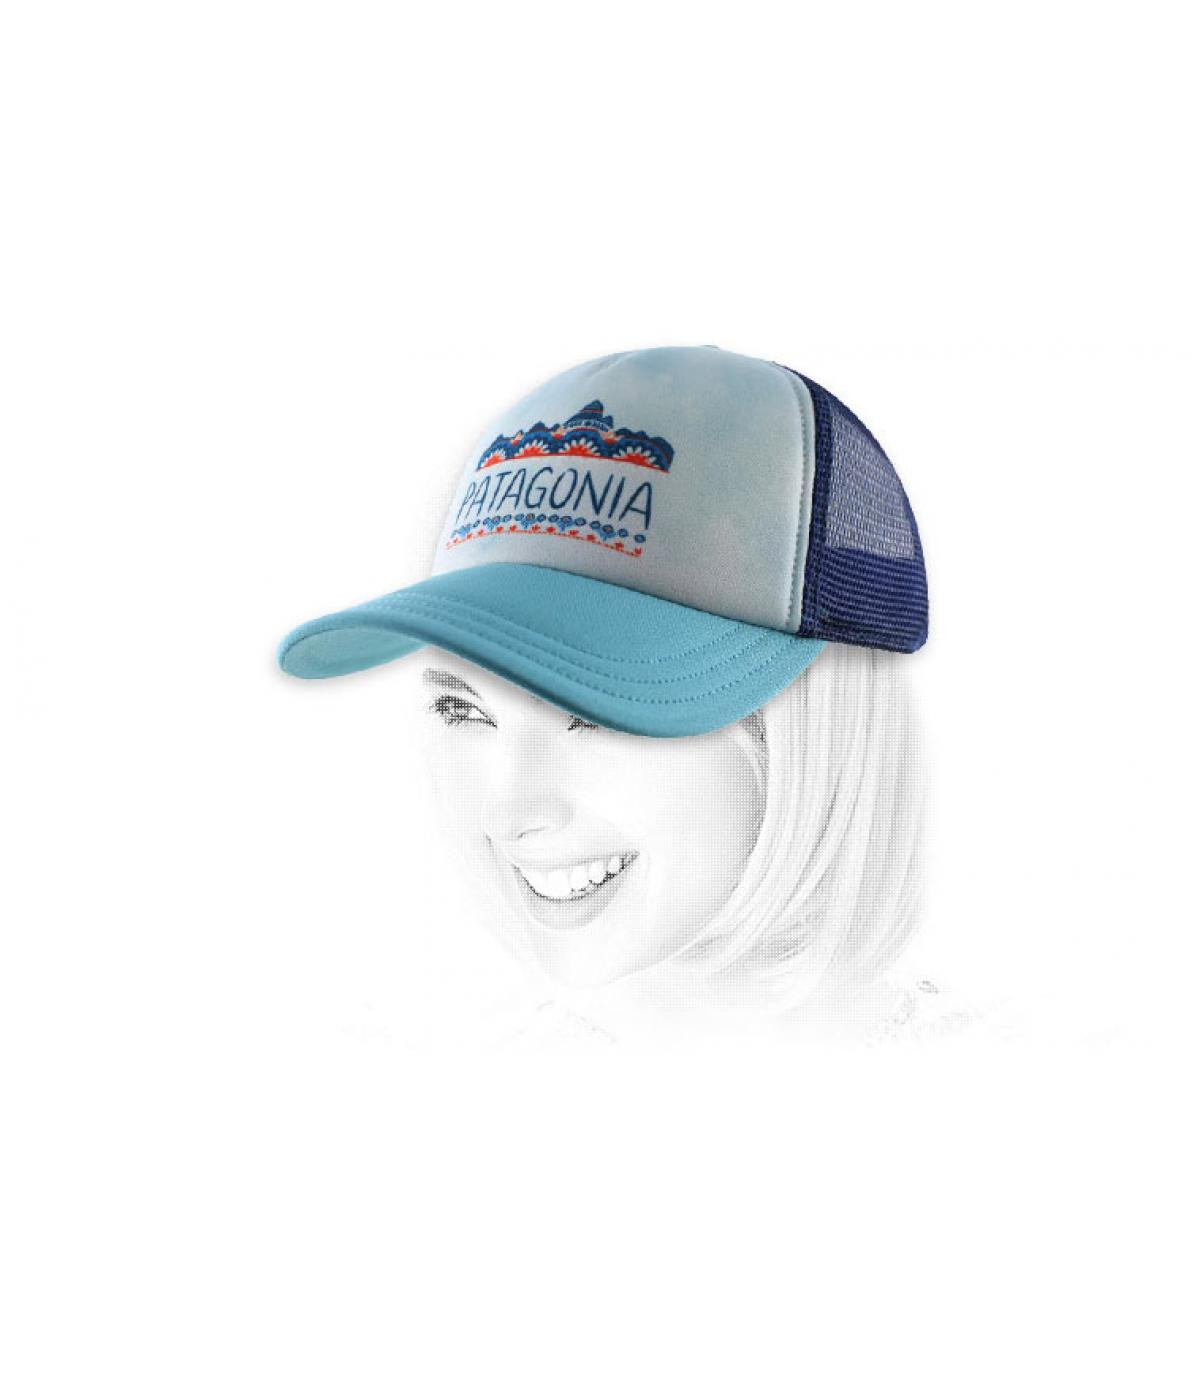 Patagonia cap donna blu